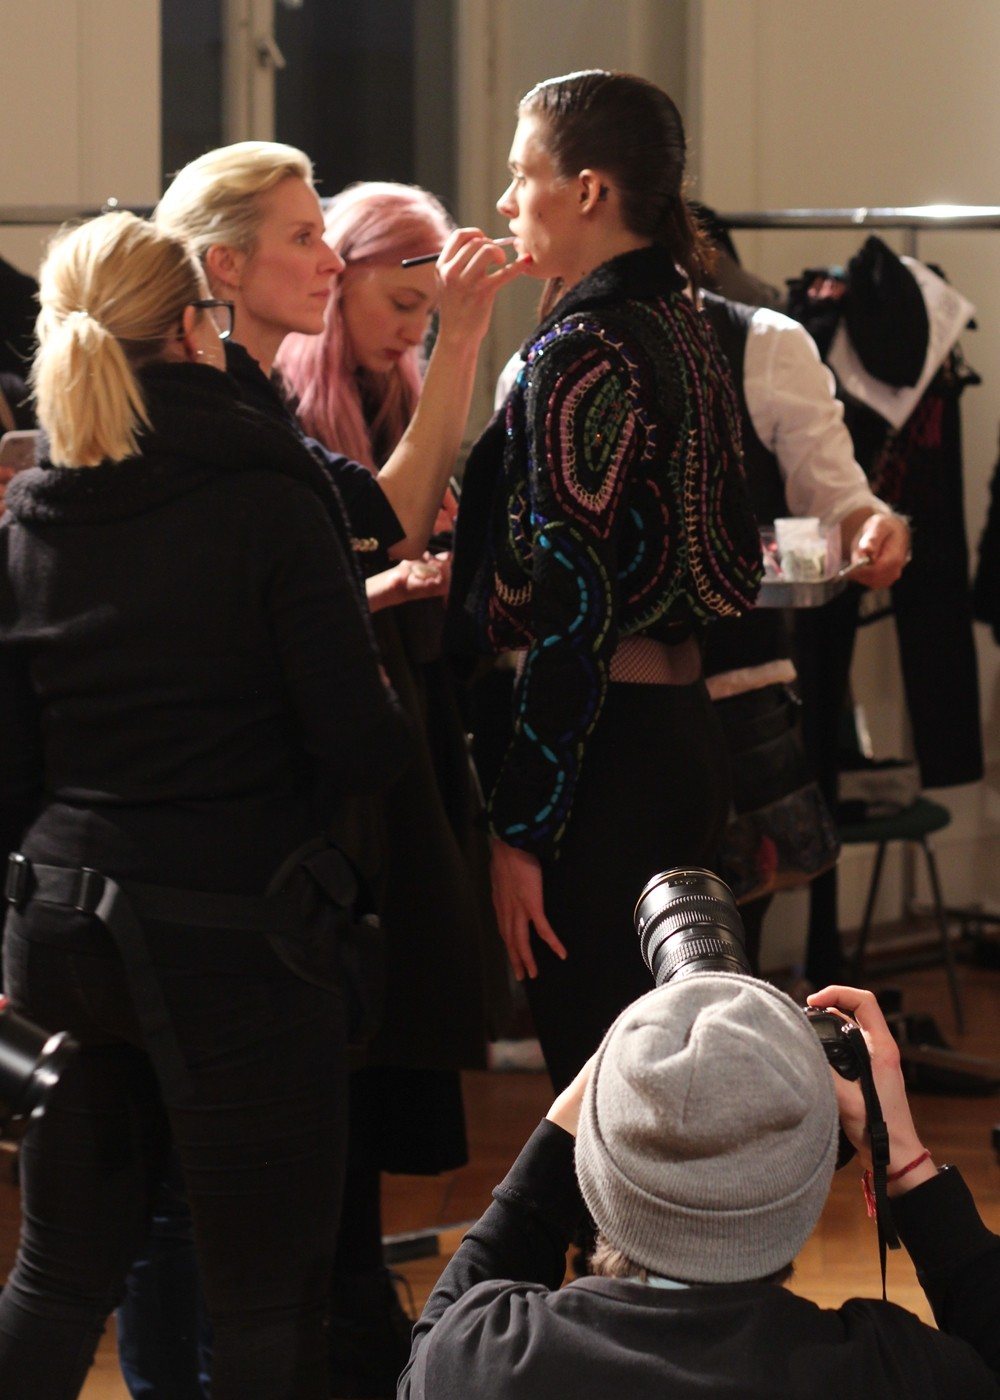 Augustin Teboul Berliner Mode Salon Runway AW 2016 Backstage Fitting 1